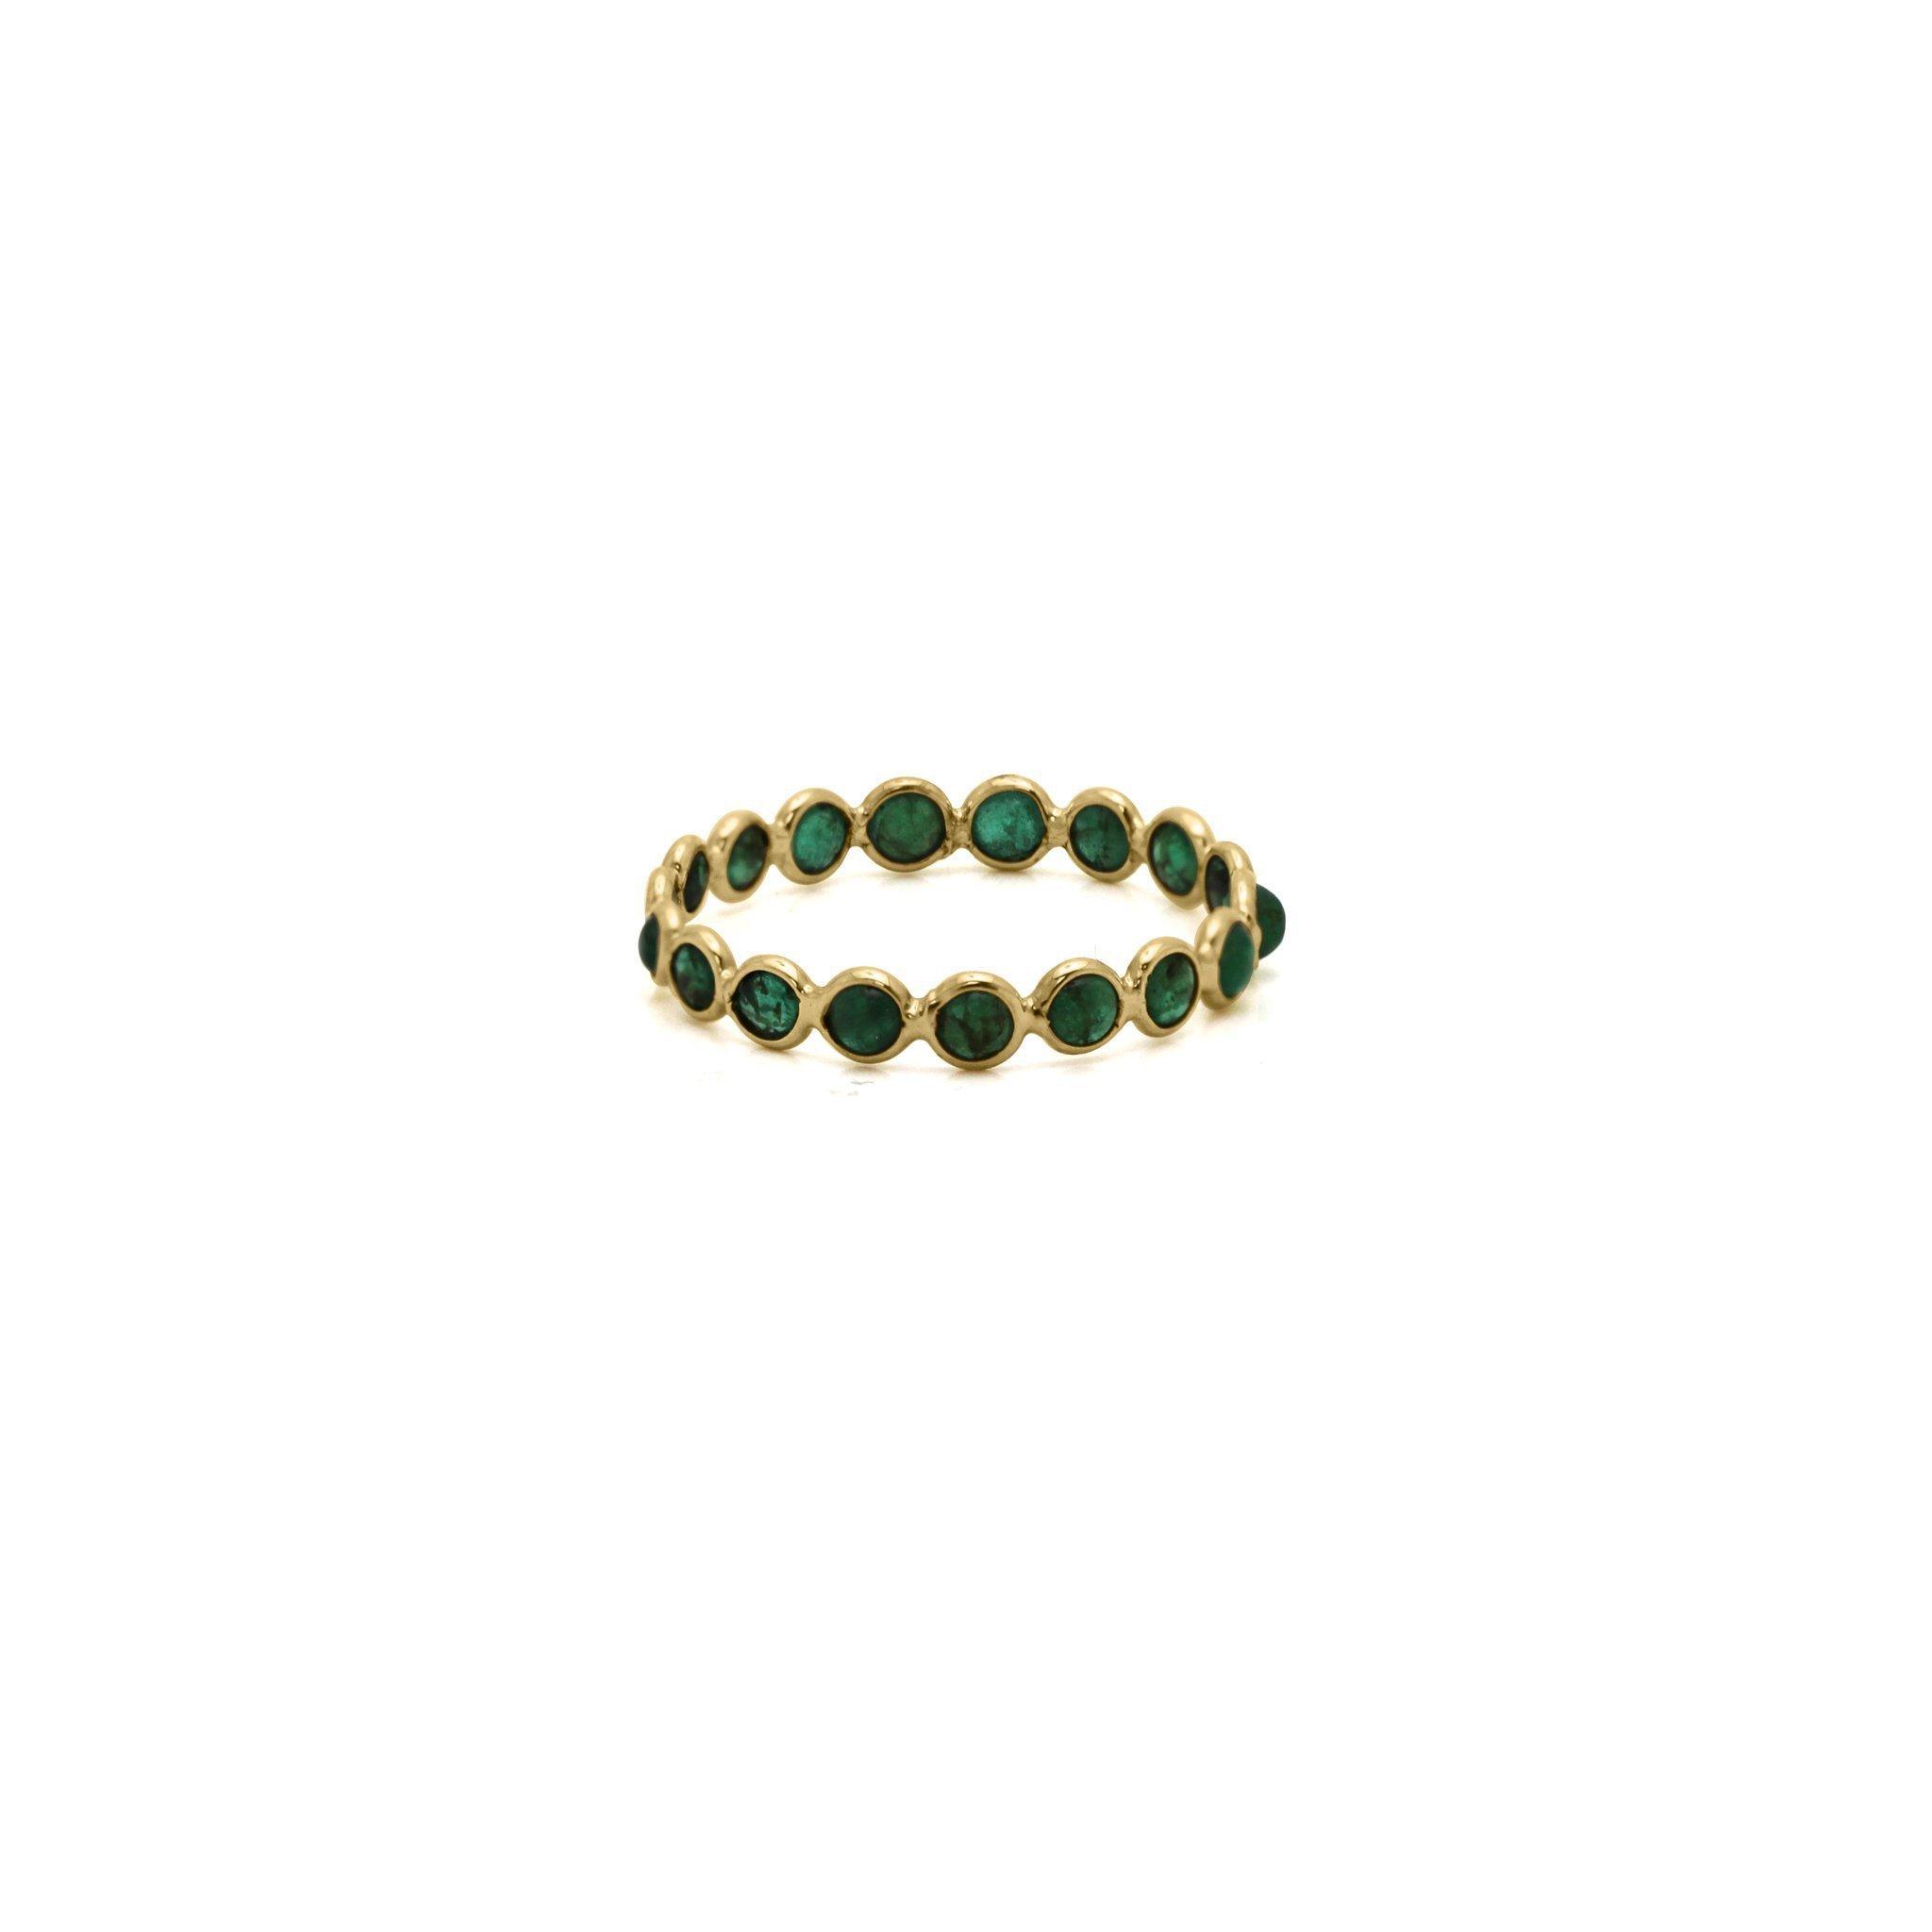 Tresor Collection - Emerald Rd CB. Ring in 18k YG